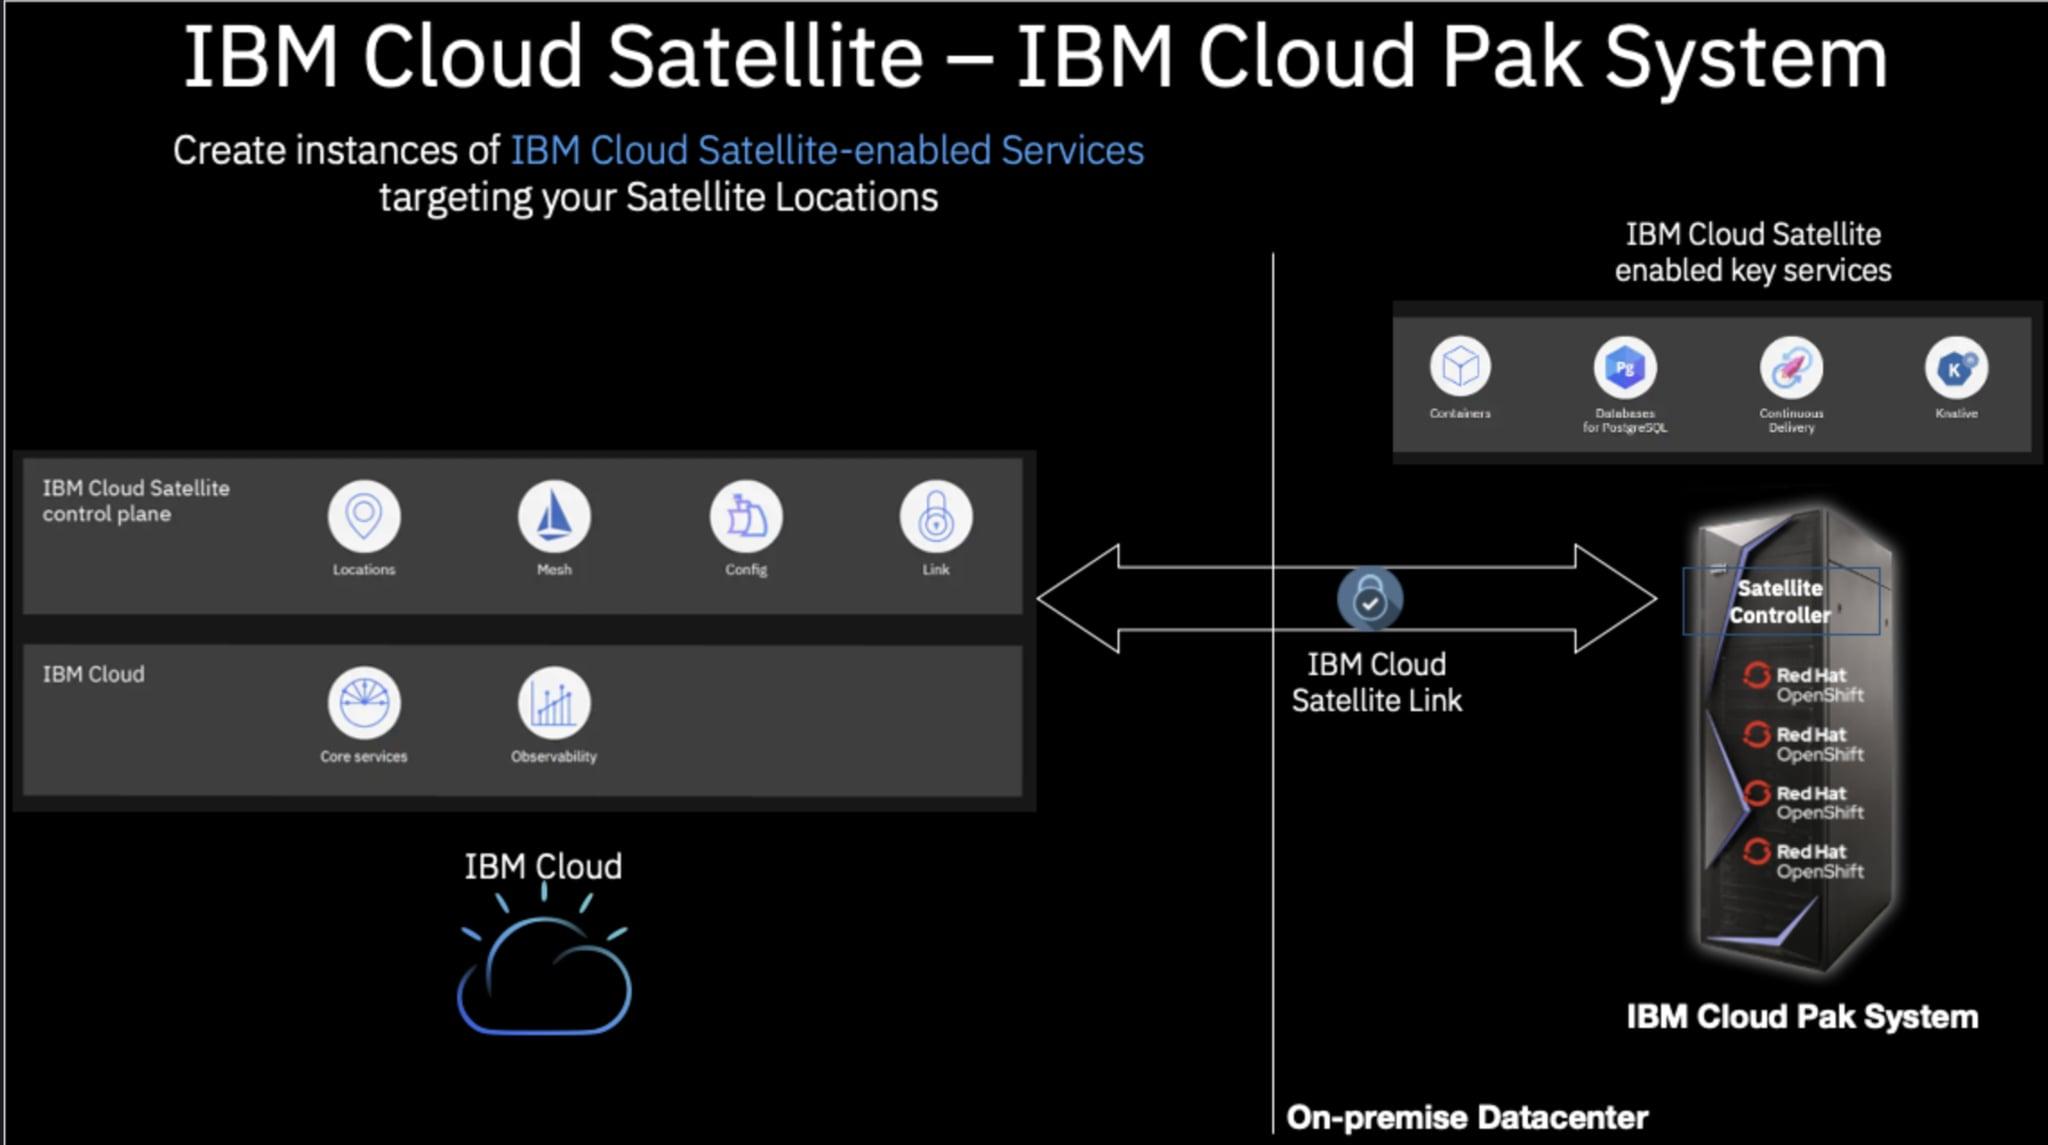 IBM Cloud Pak System